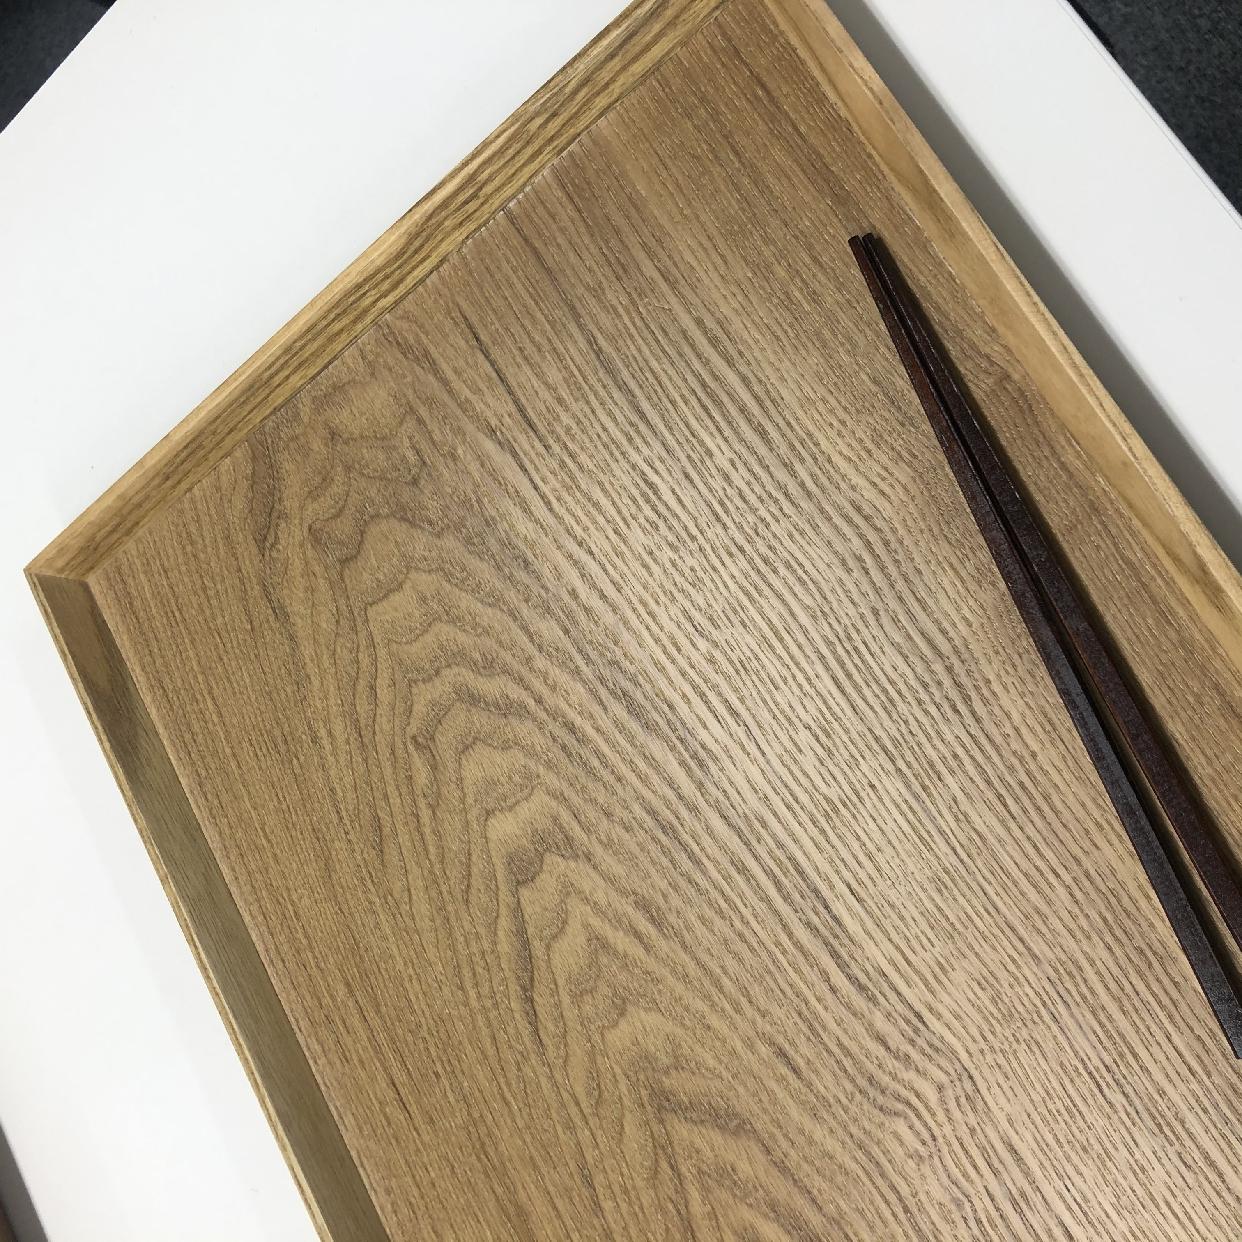 Table Ware East(テーブルウェアイースト)木製 ナチュラルスタックトレー44cm(LL)を使った             わっきーさんのクチコミ画像